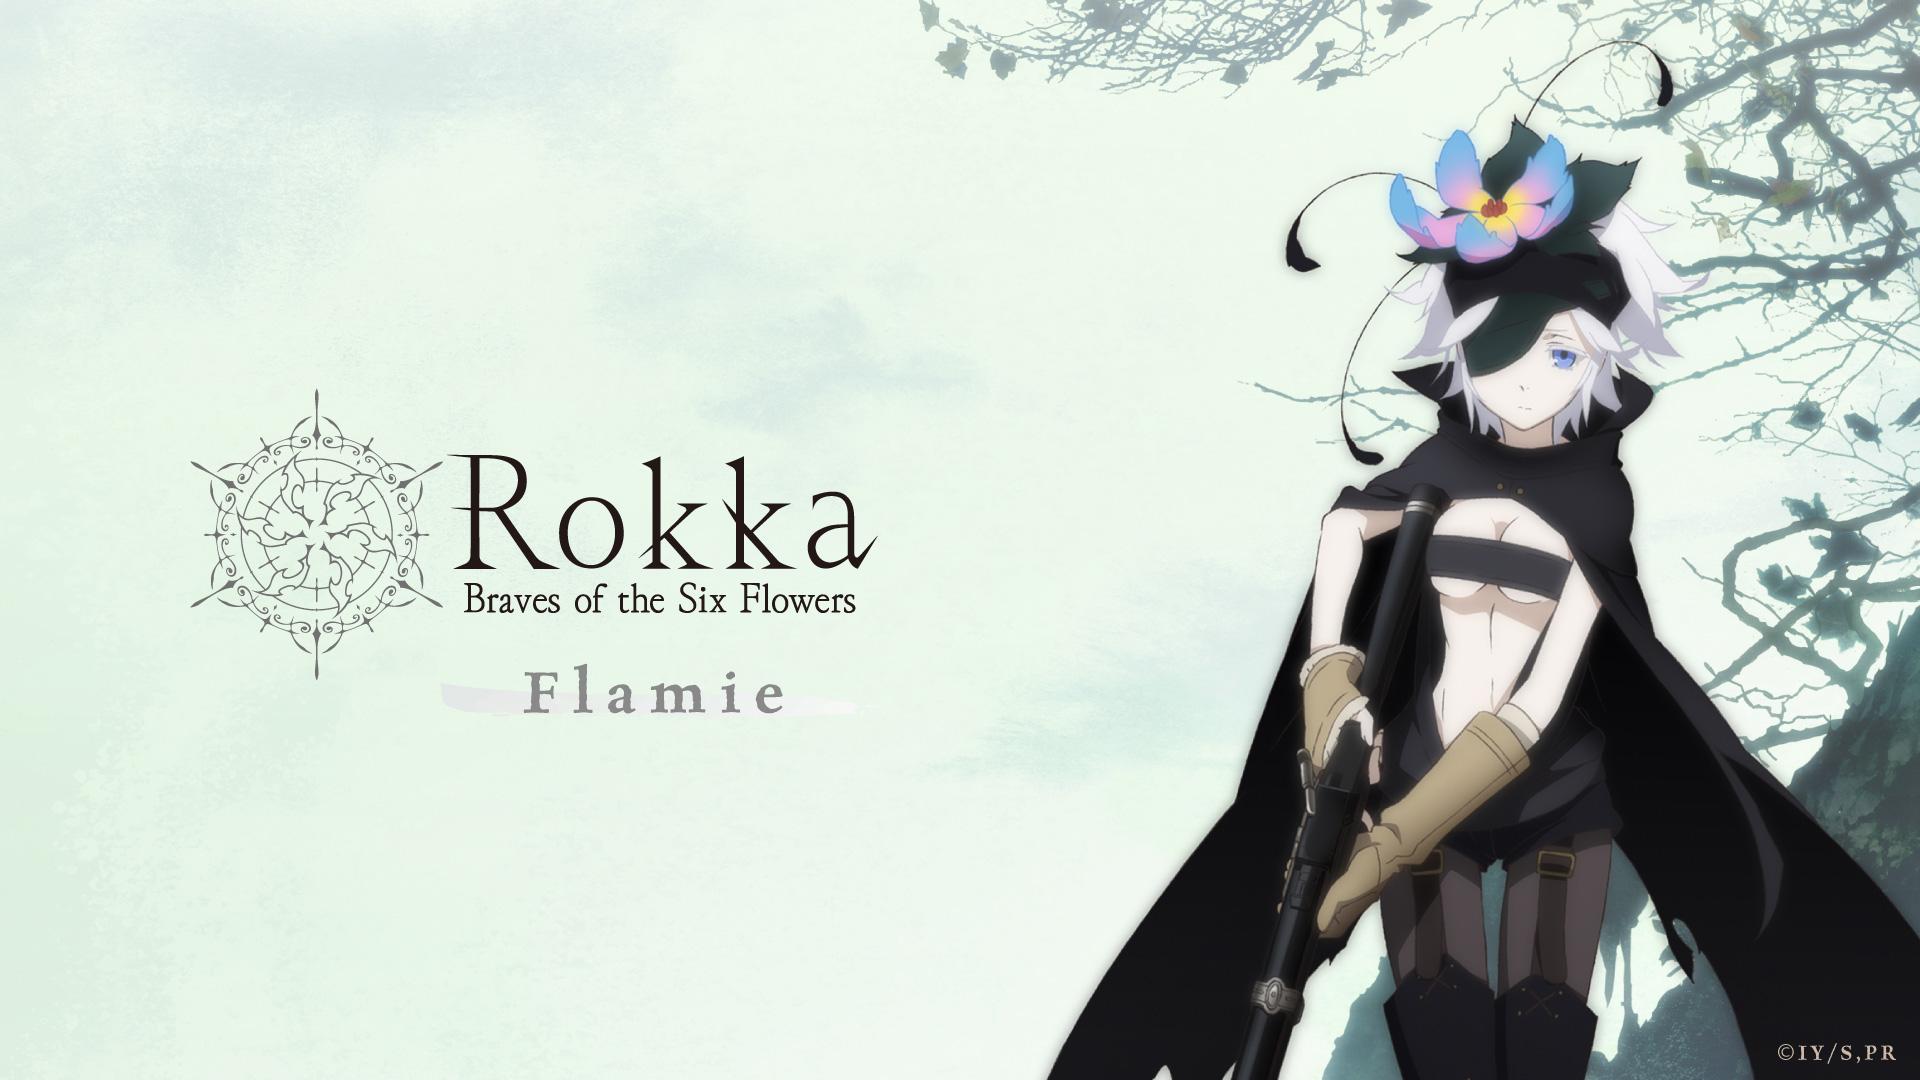 Rokka-no-Yuusha-Anime-Wallpaper-Fremie-Speeddraw